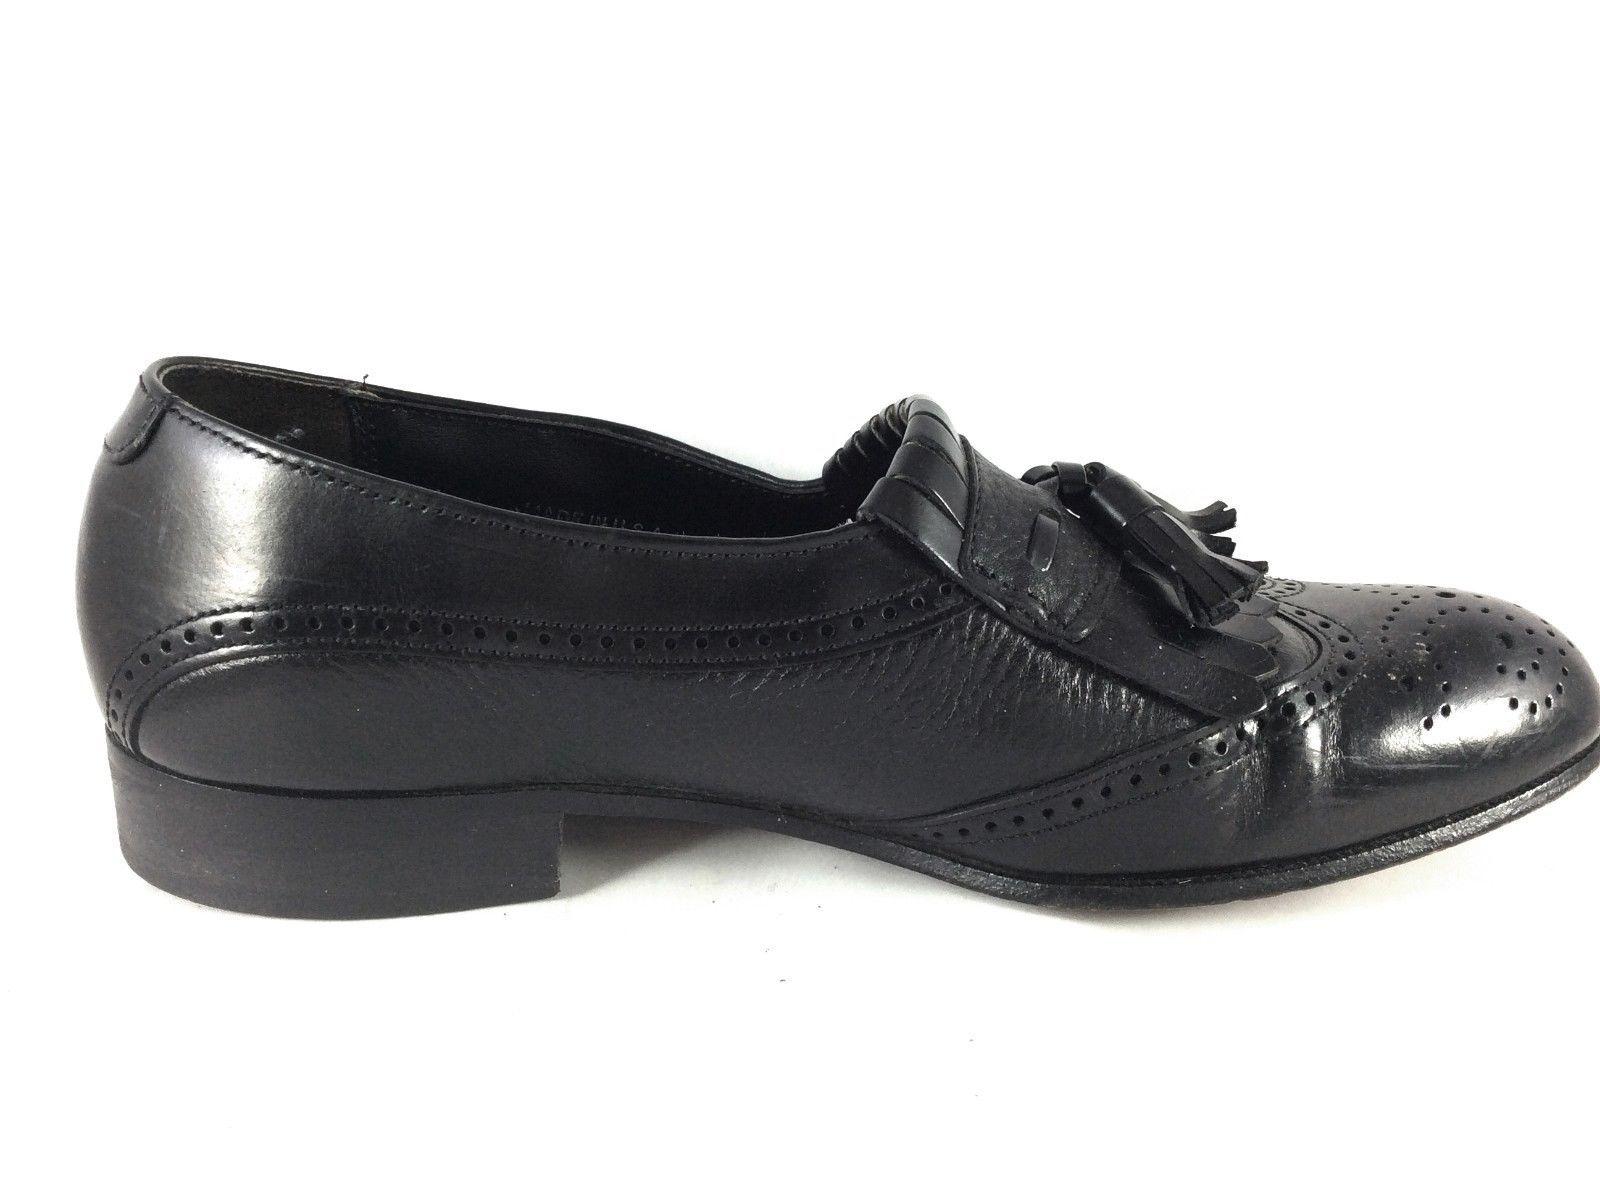 Dexter Men's Black Leather Kiltie Tassel Wingtip Slip On Loafer 436953 size 8.5M